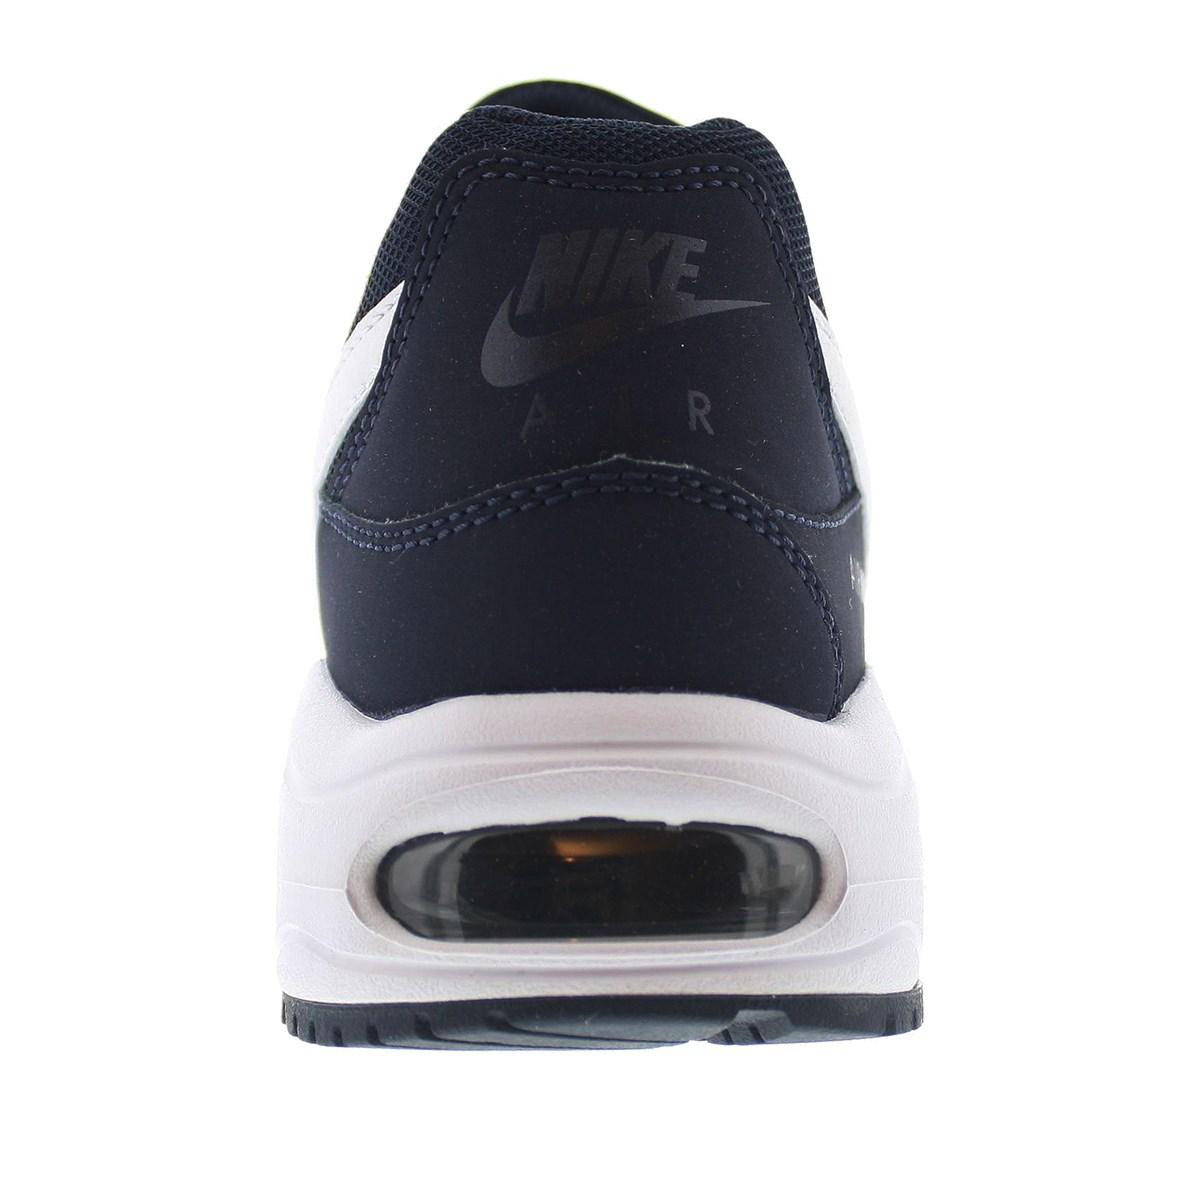 Air Max Command Flex Kadın Siyah Ayakkabı